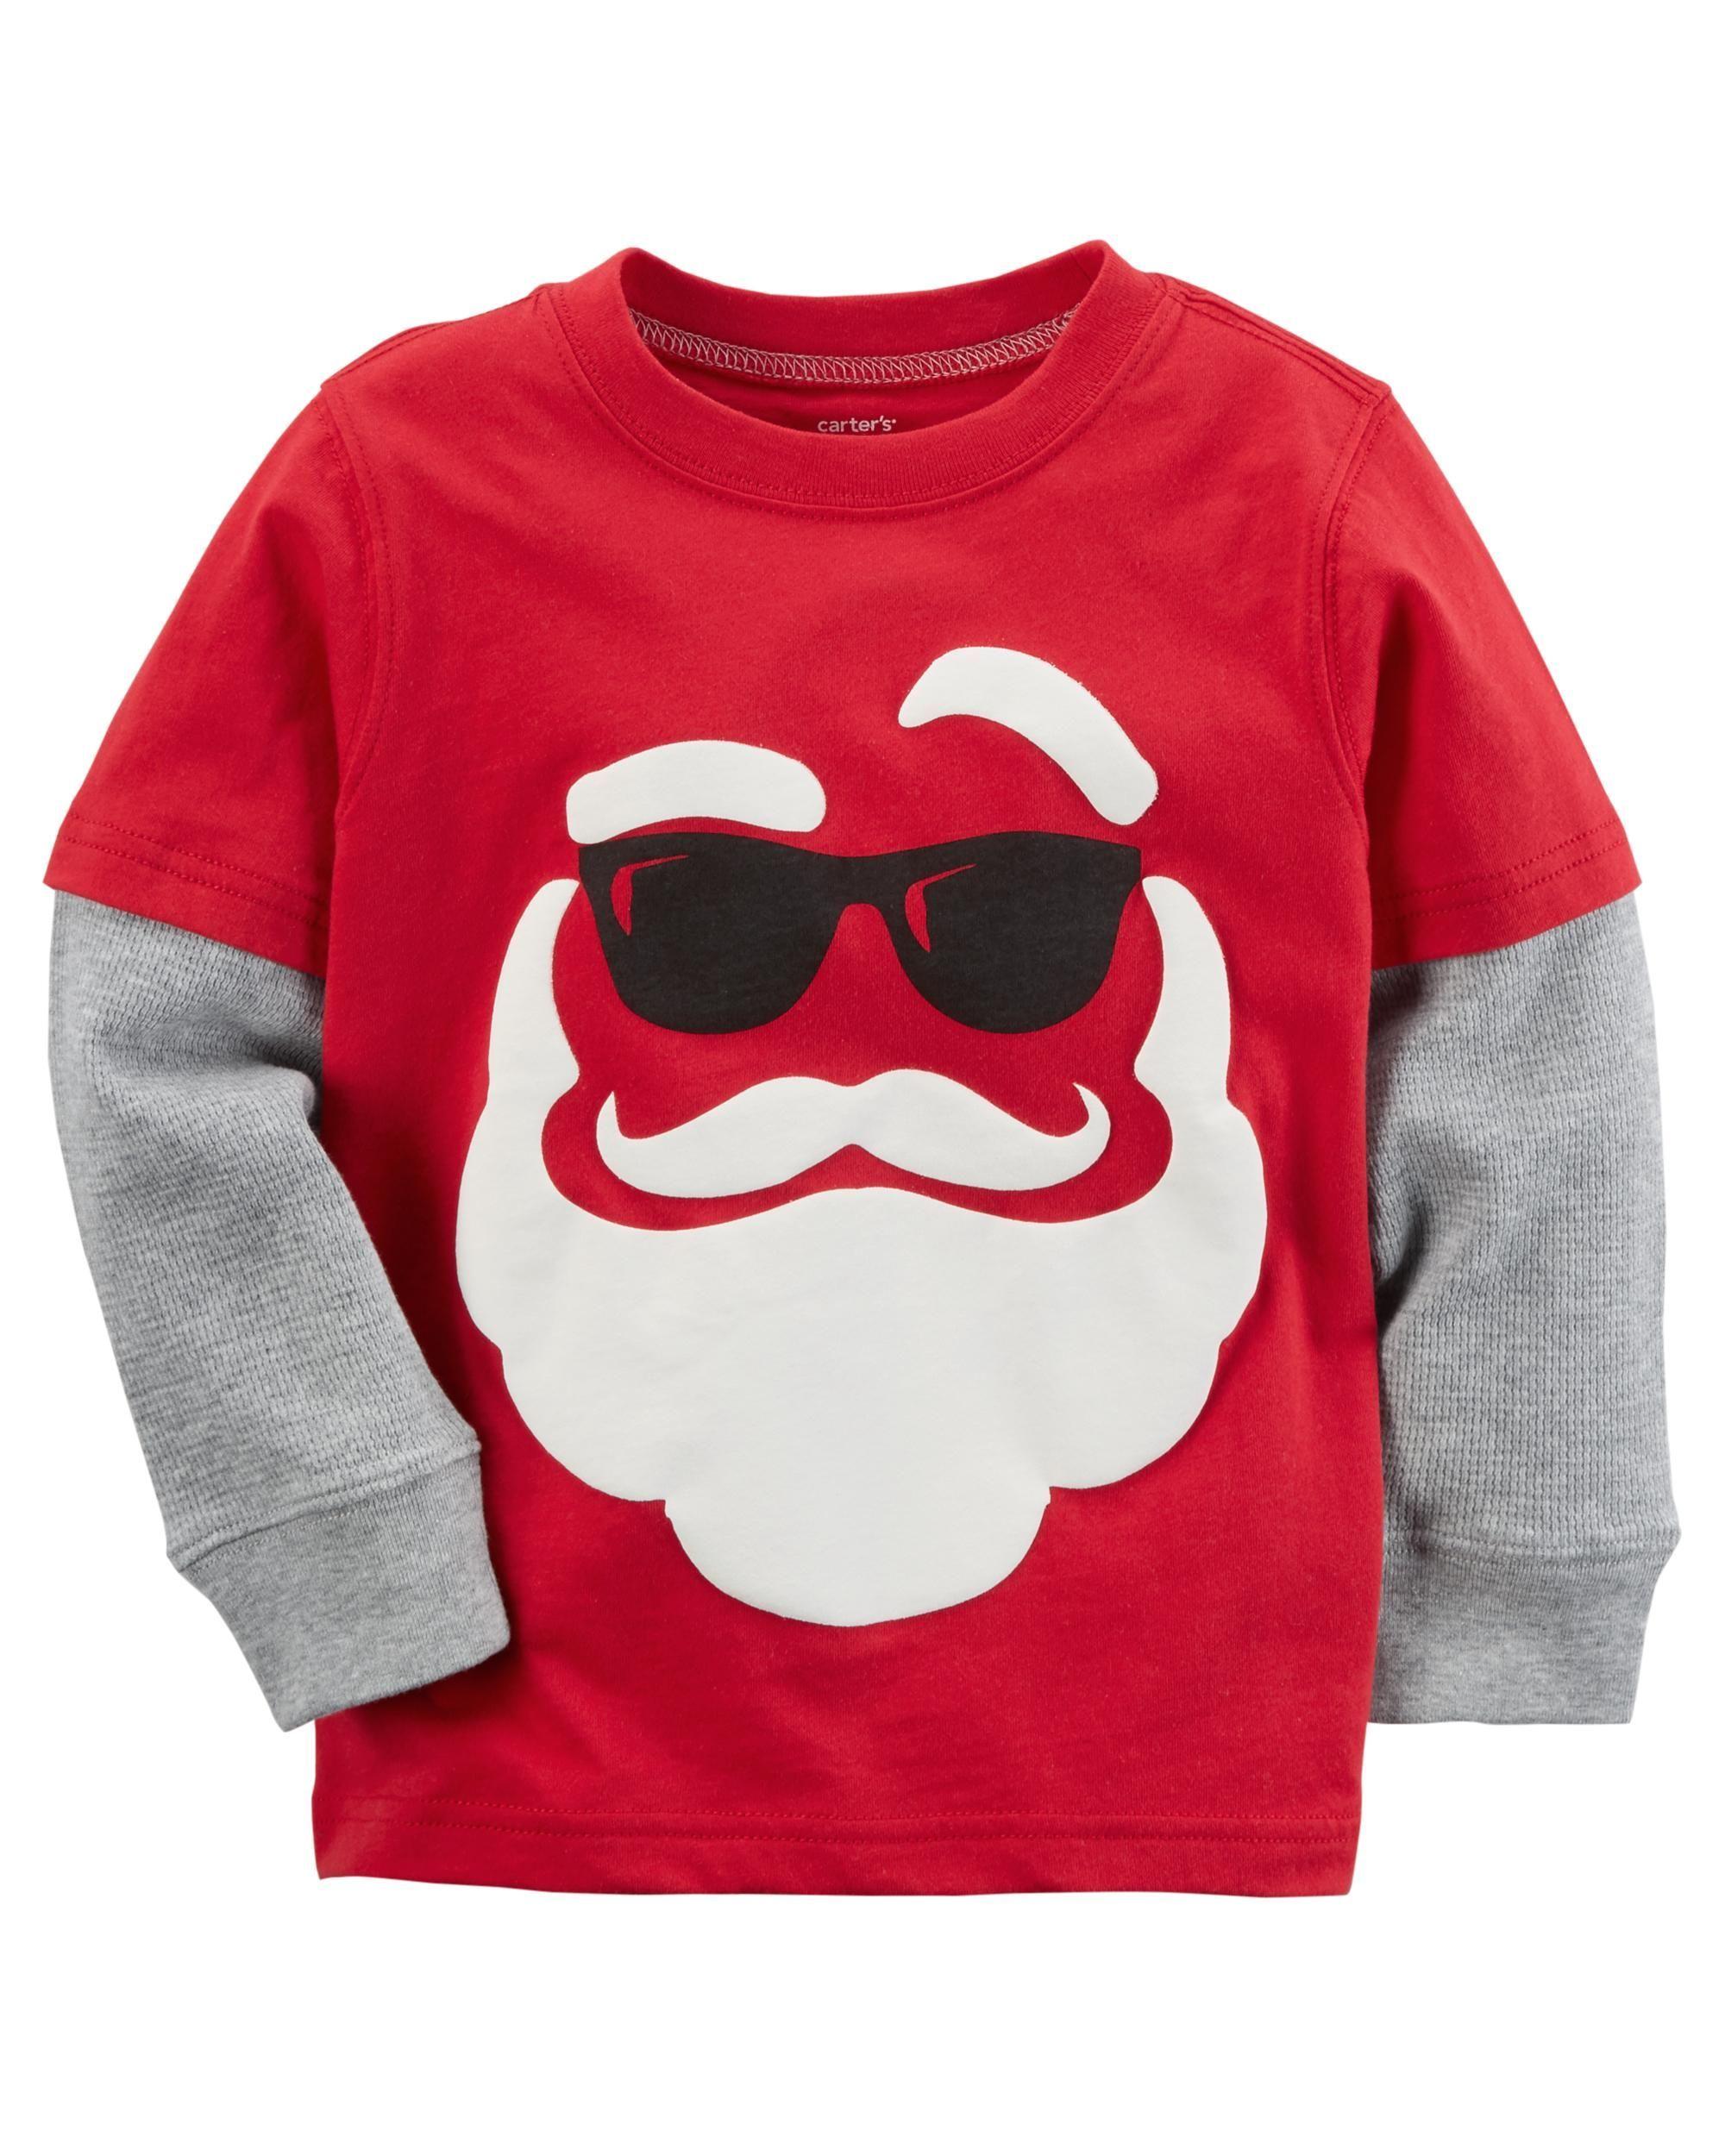 New CARTER/'S Boy/'s Santa Pajamas 6m 12m Christmas Holiday Red